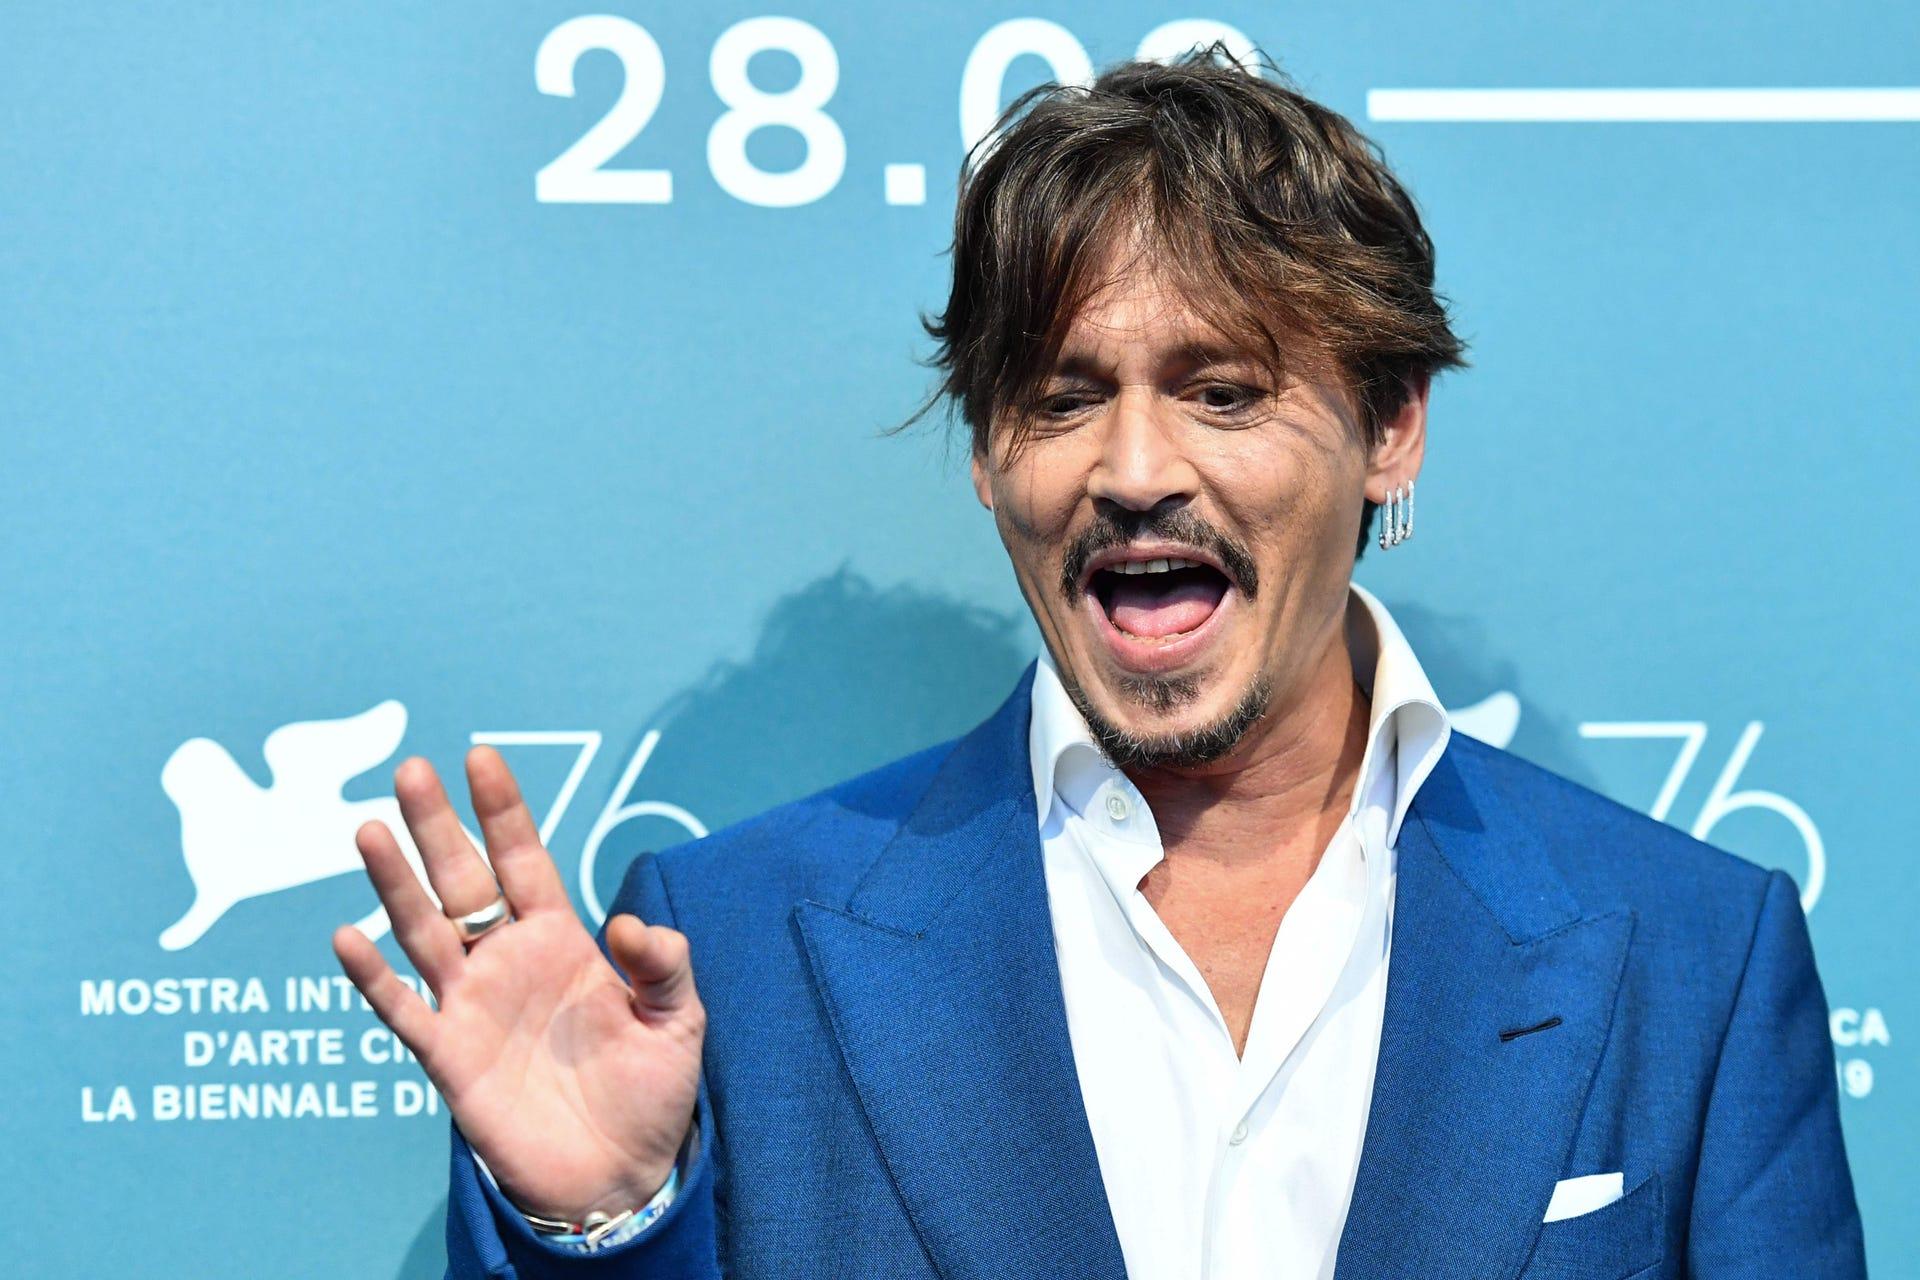 Venice Film Festival 2019: See Johnny Depp, Timothee